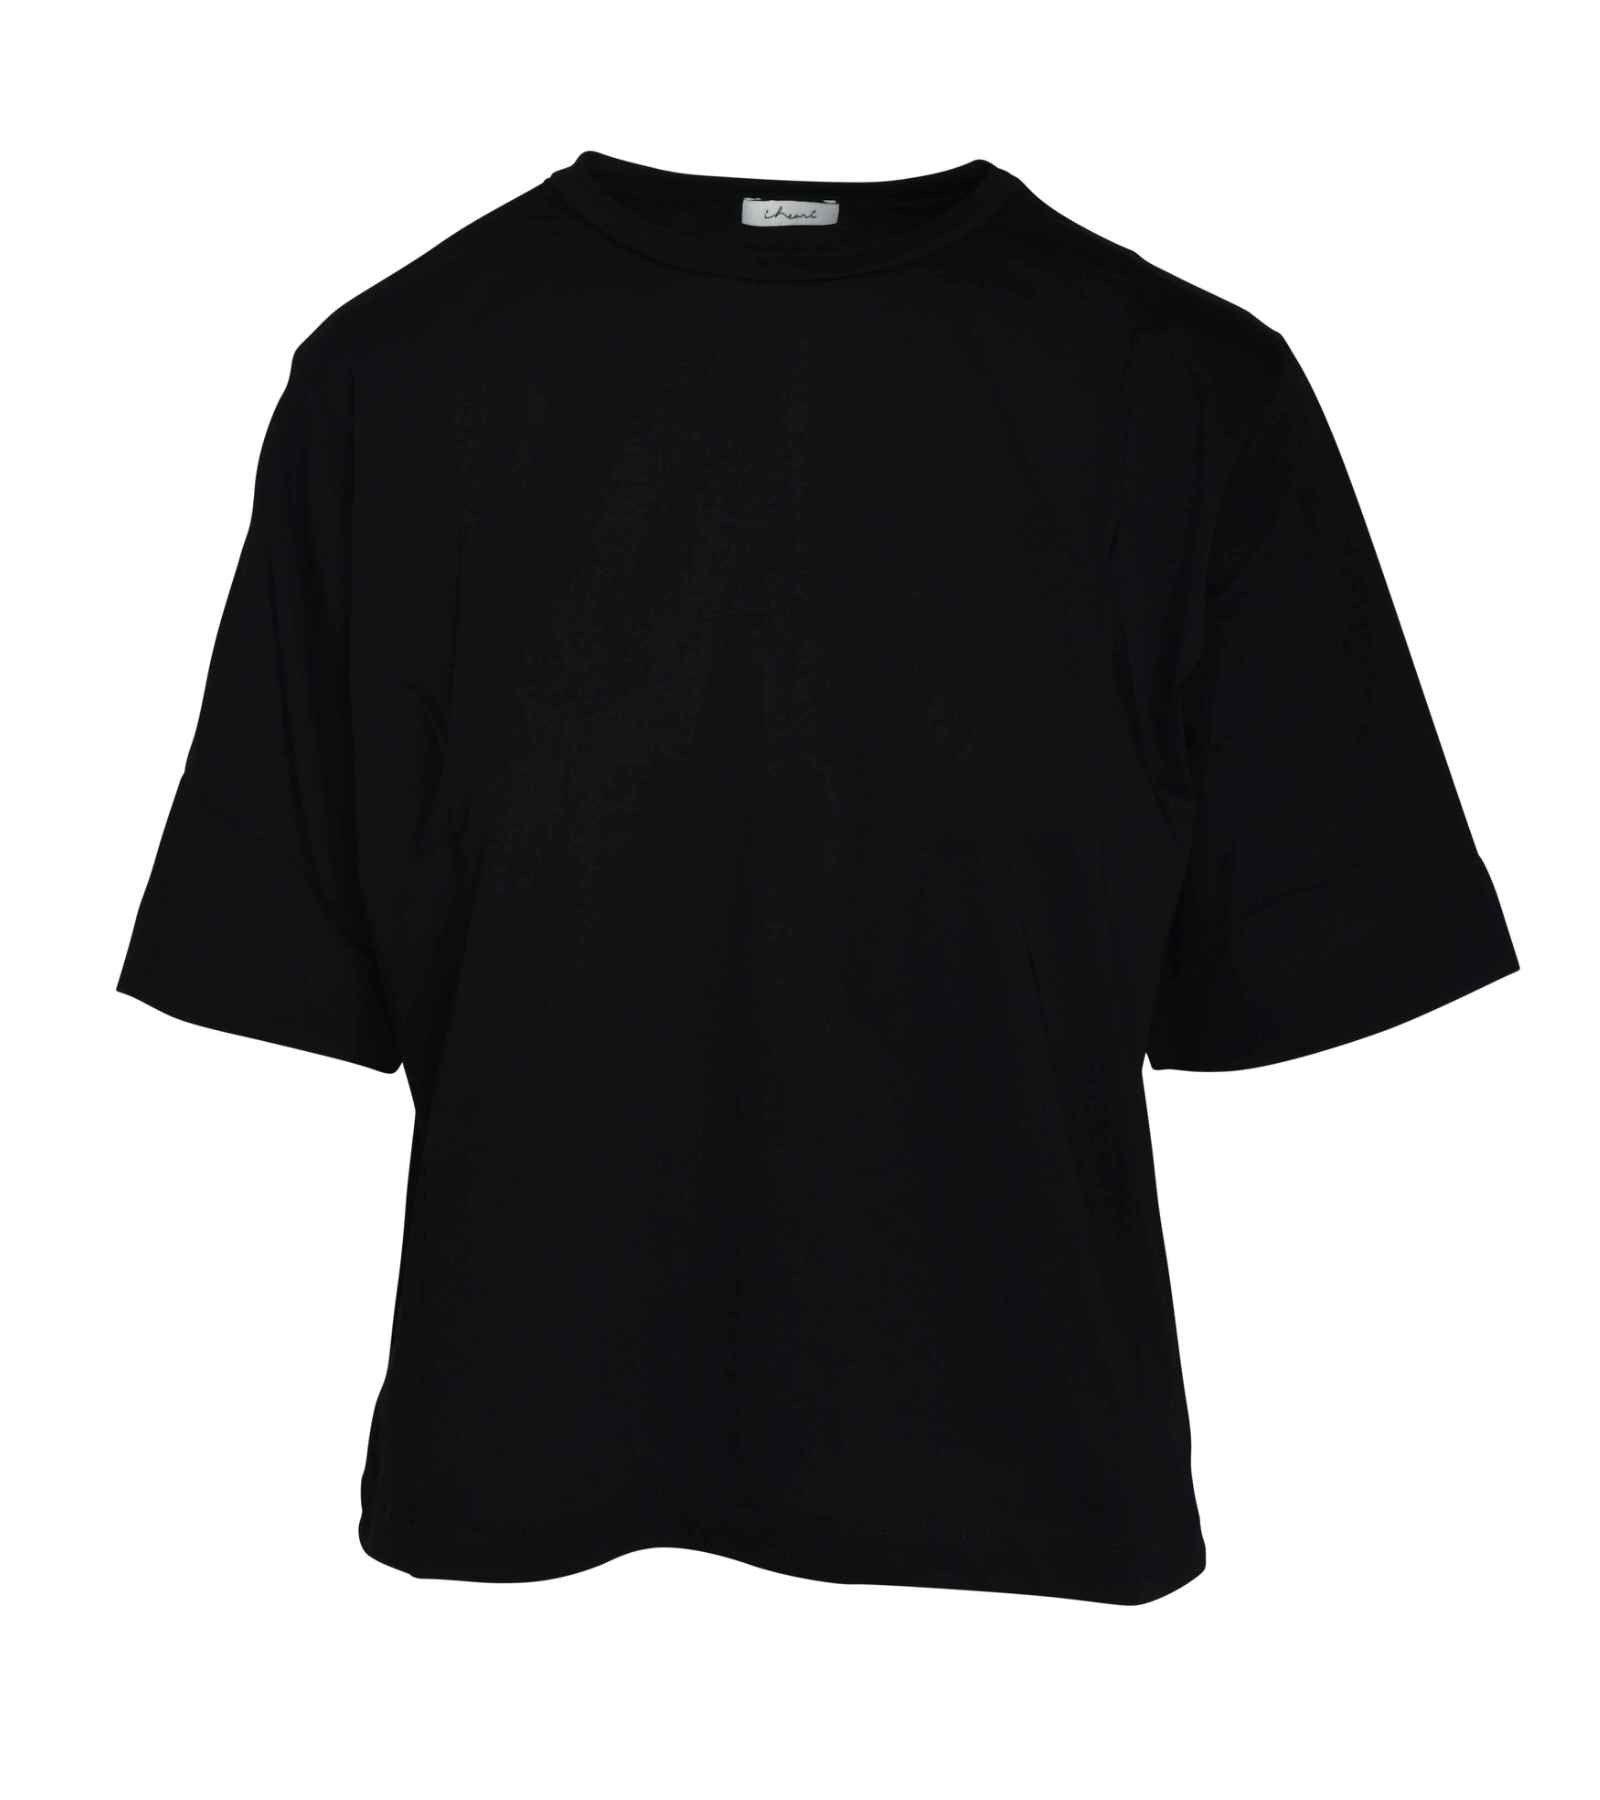 iHEART - Damen Shirt - Abela-Black